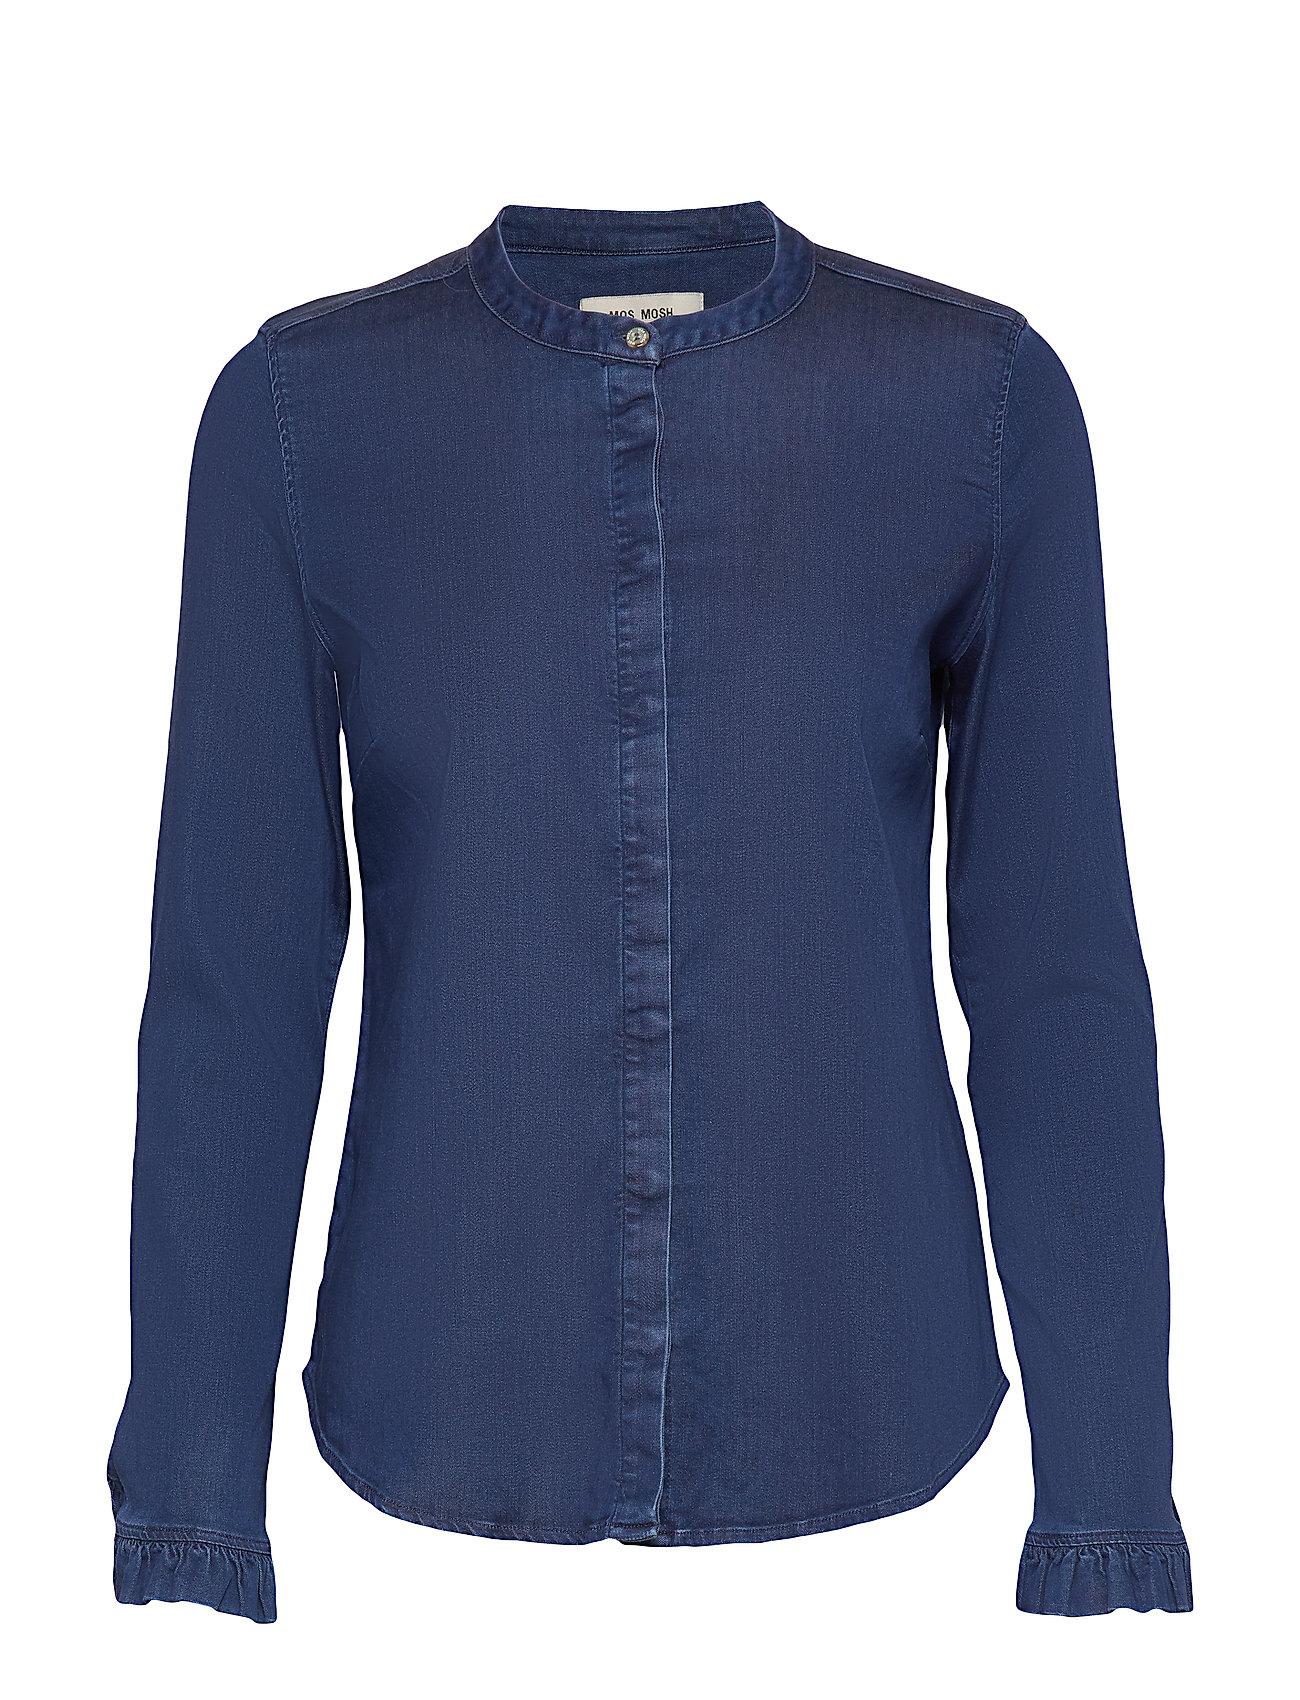 MOS MOSH Mattie Denim Shirt - BLUE